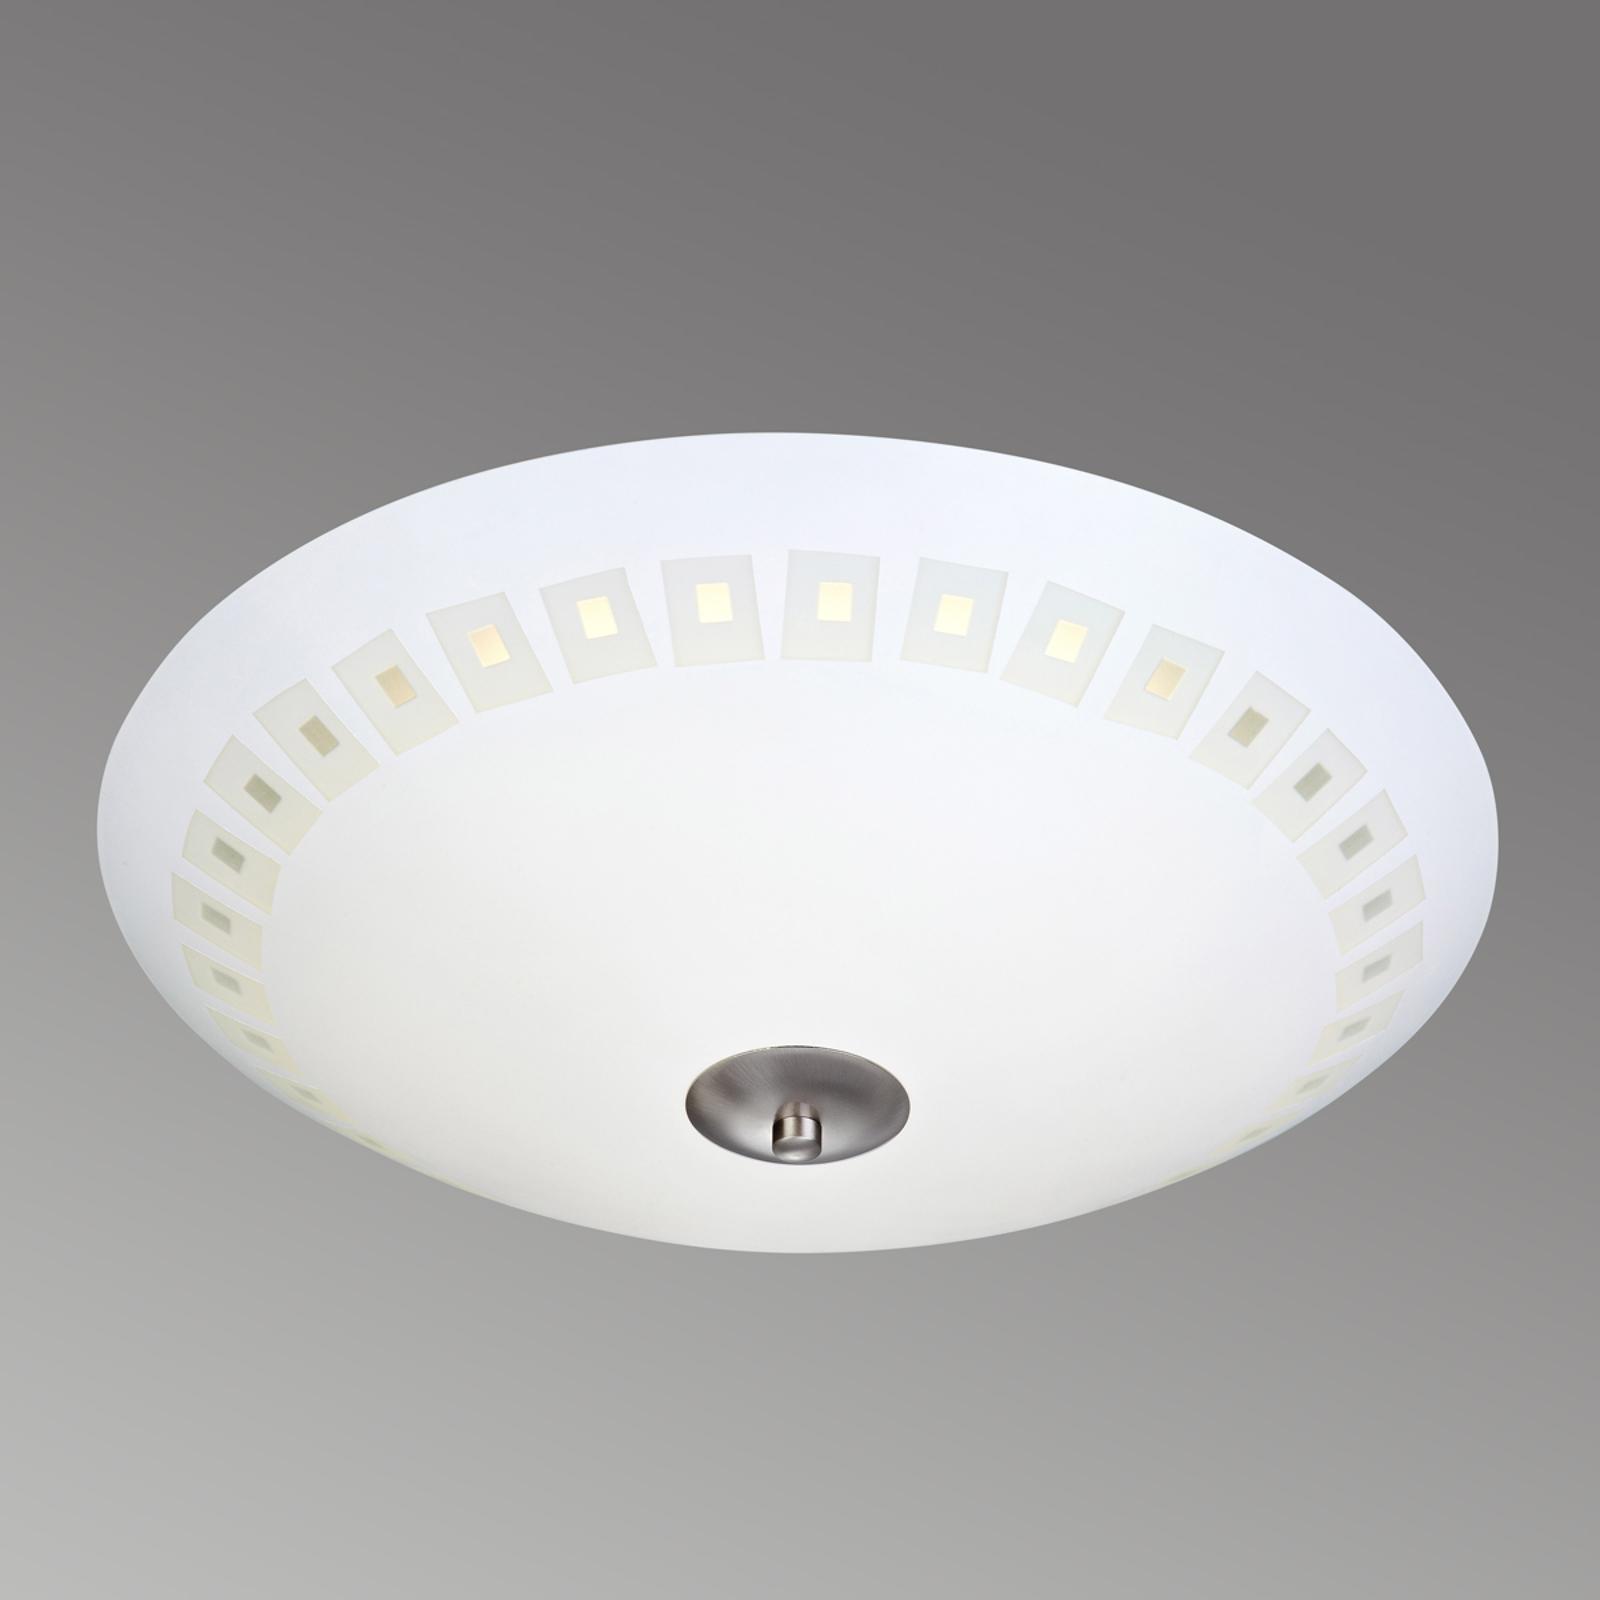 LED-taklampe Adria